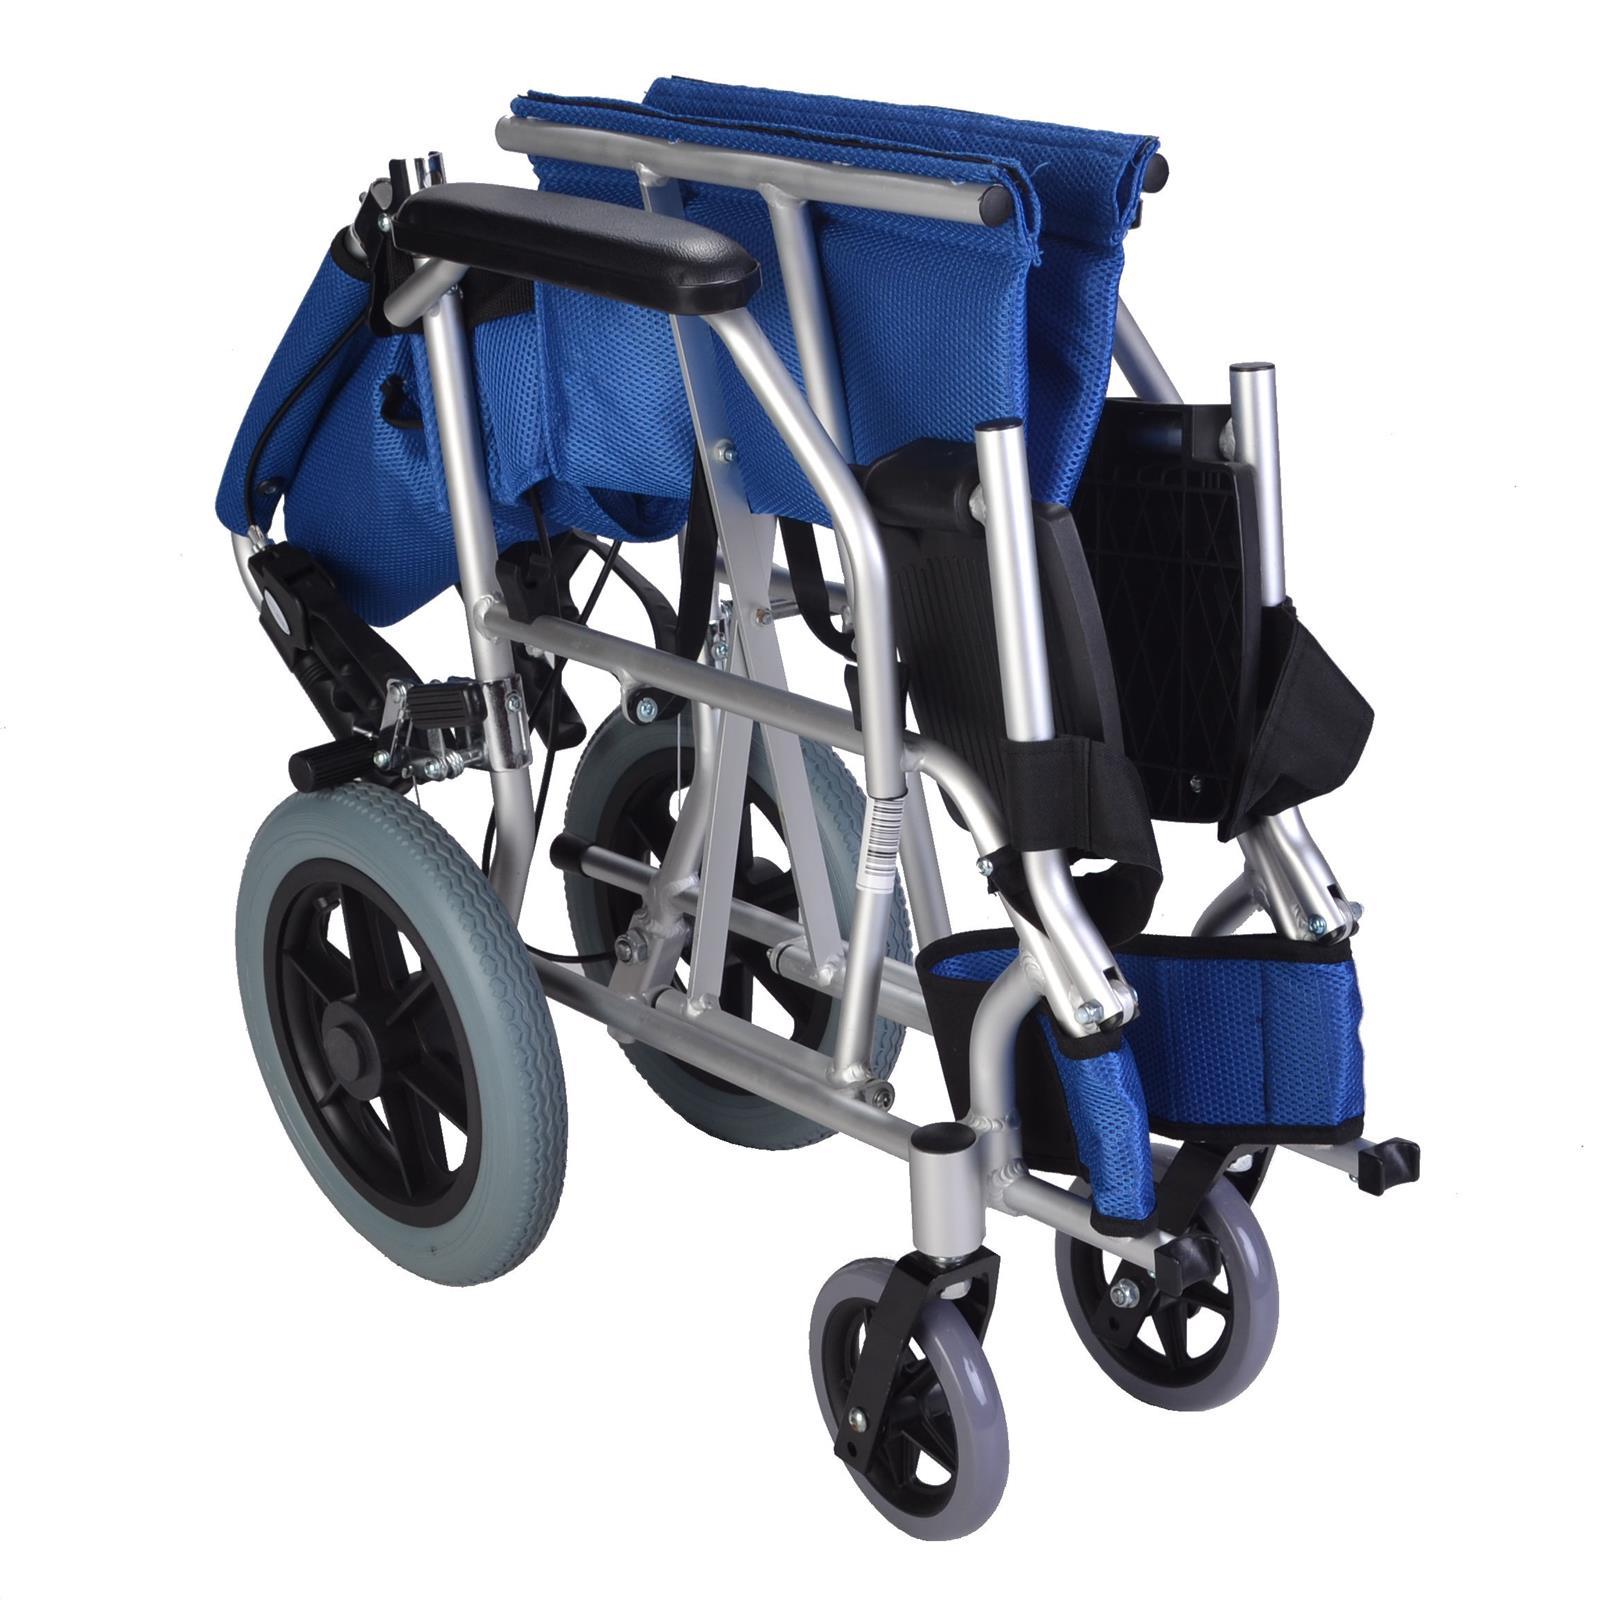 Lightweight Folding Compact Wheelchair Ec1863 Elite Care